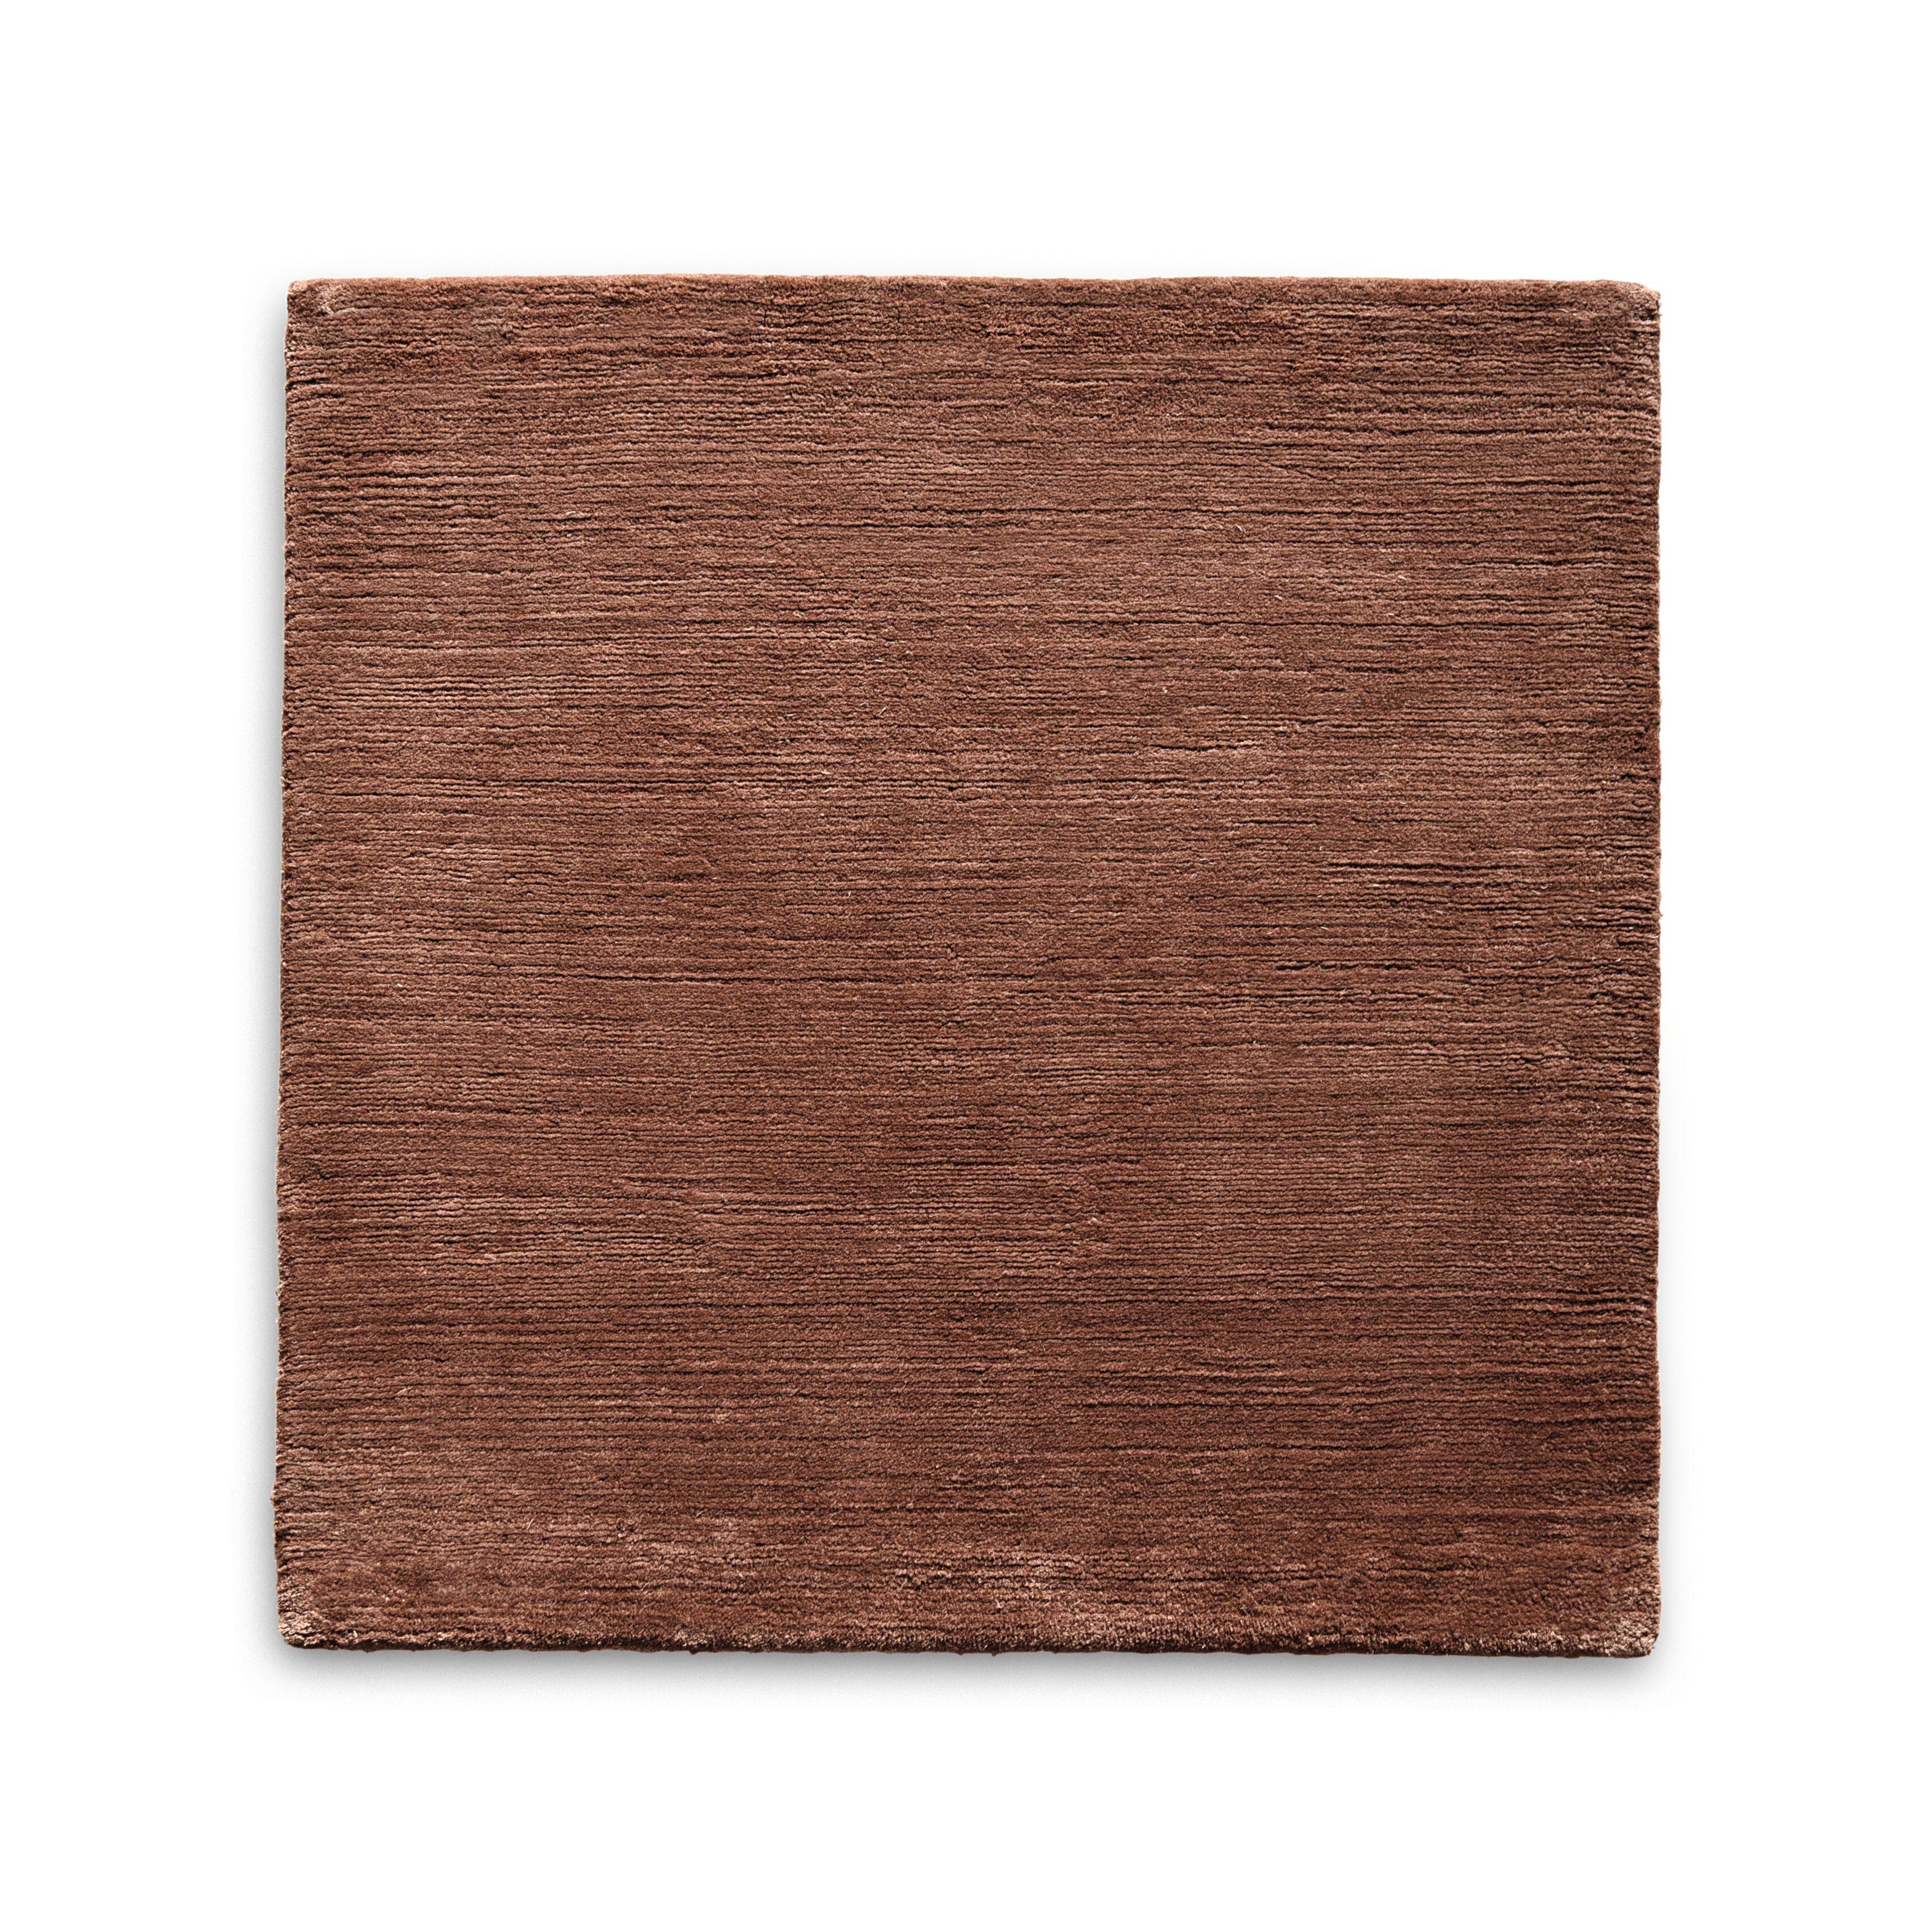 02-WK-Legends_of_carpets-Tumalini-0001-H.tif